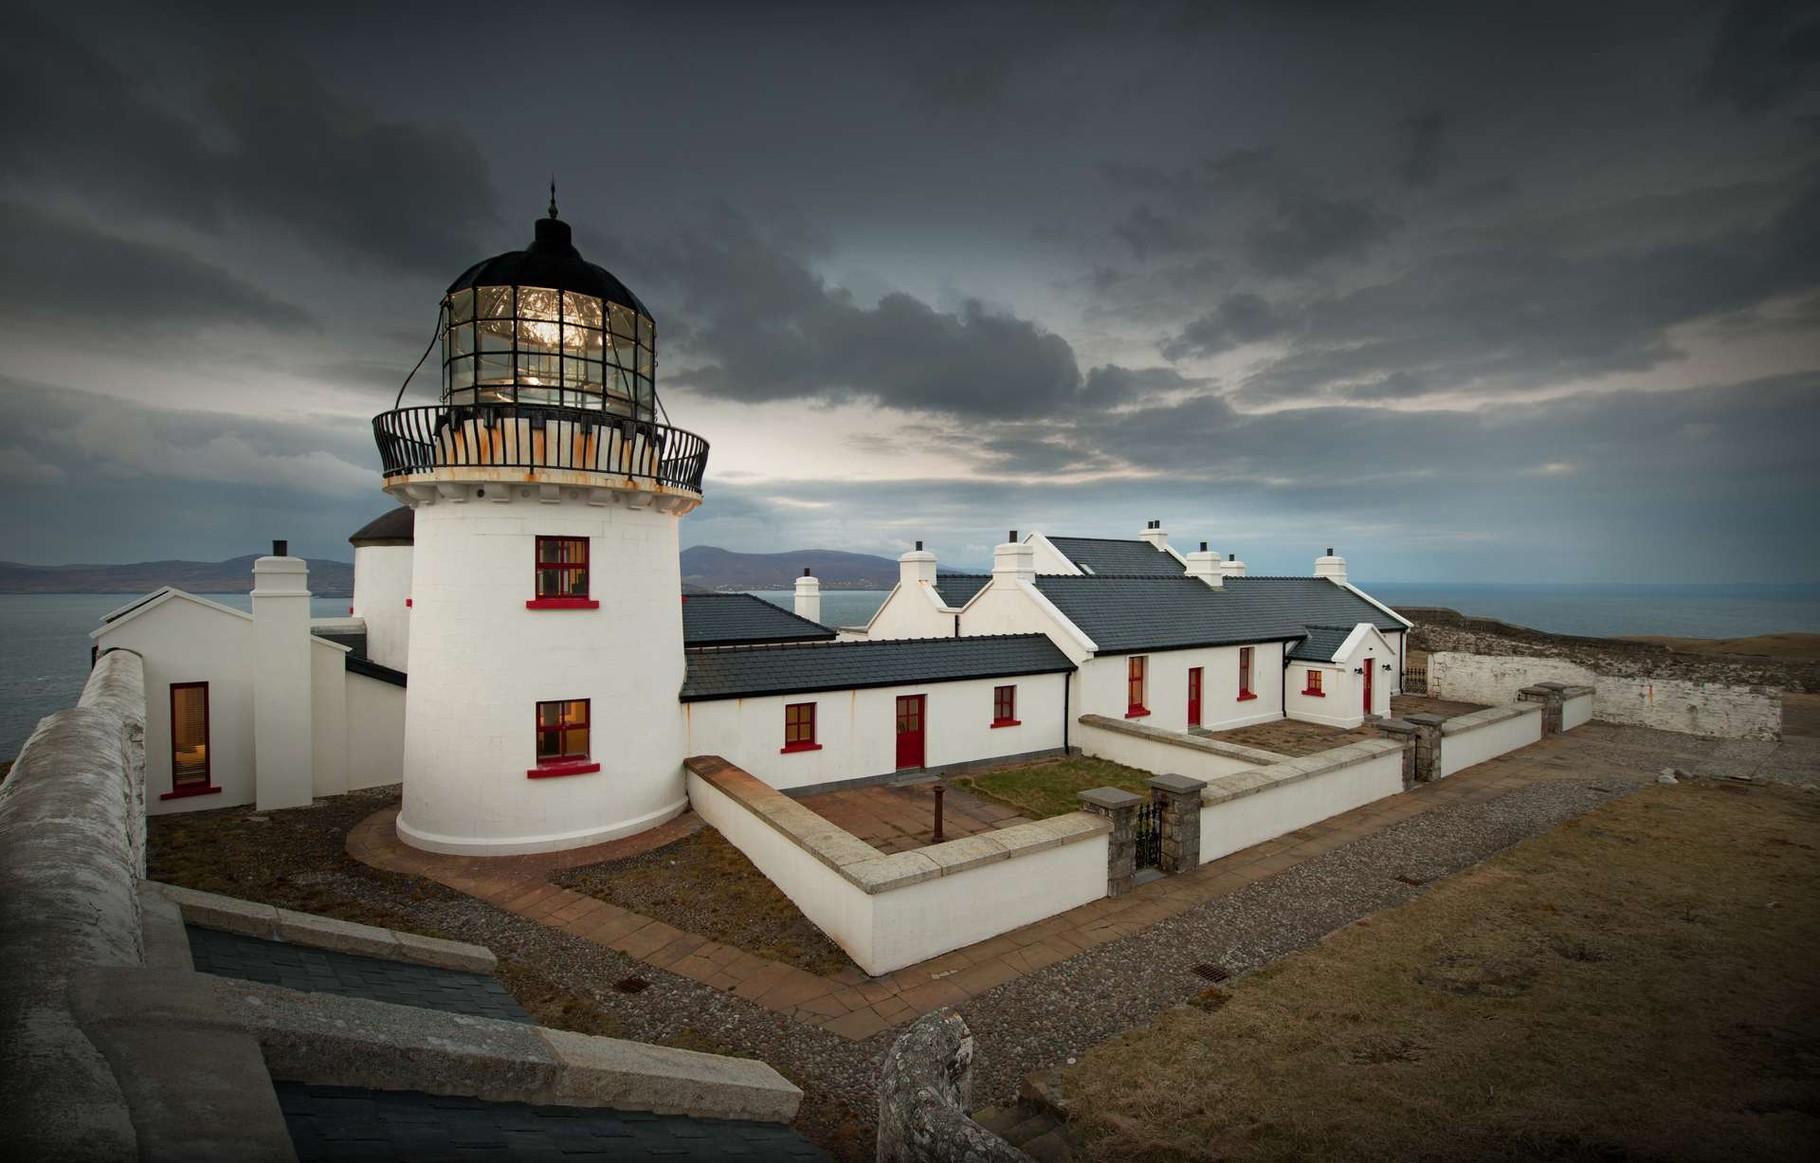 Clare Island Lighthouse - hoch über dem Meer